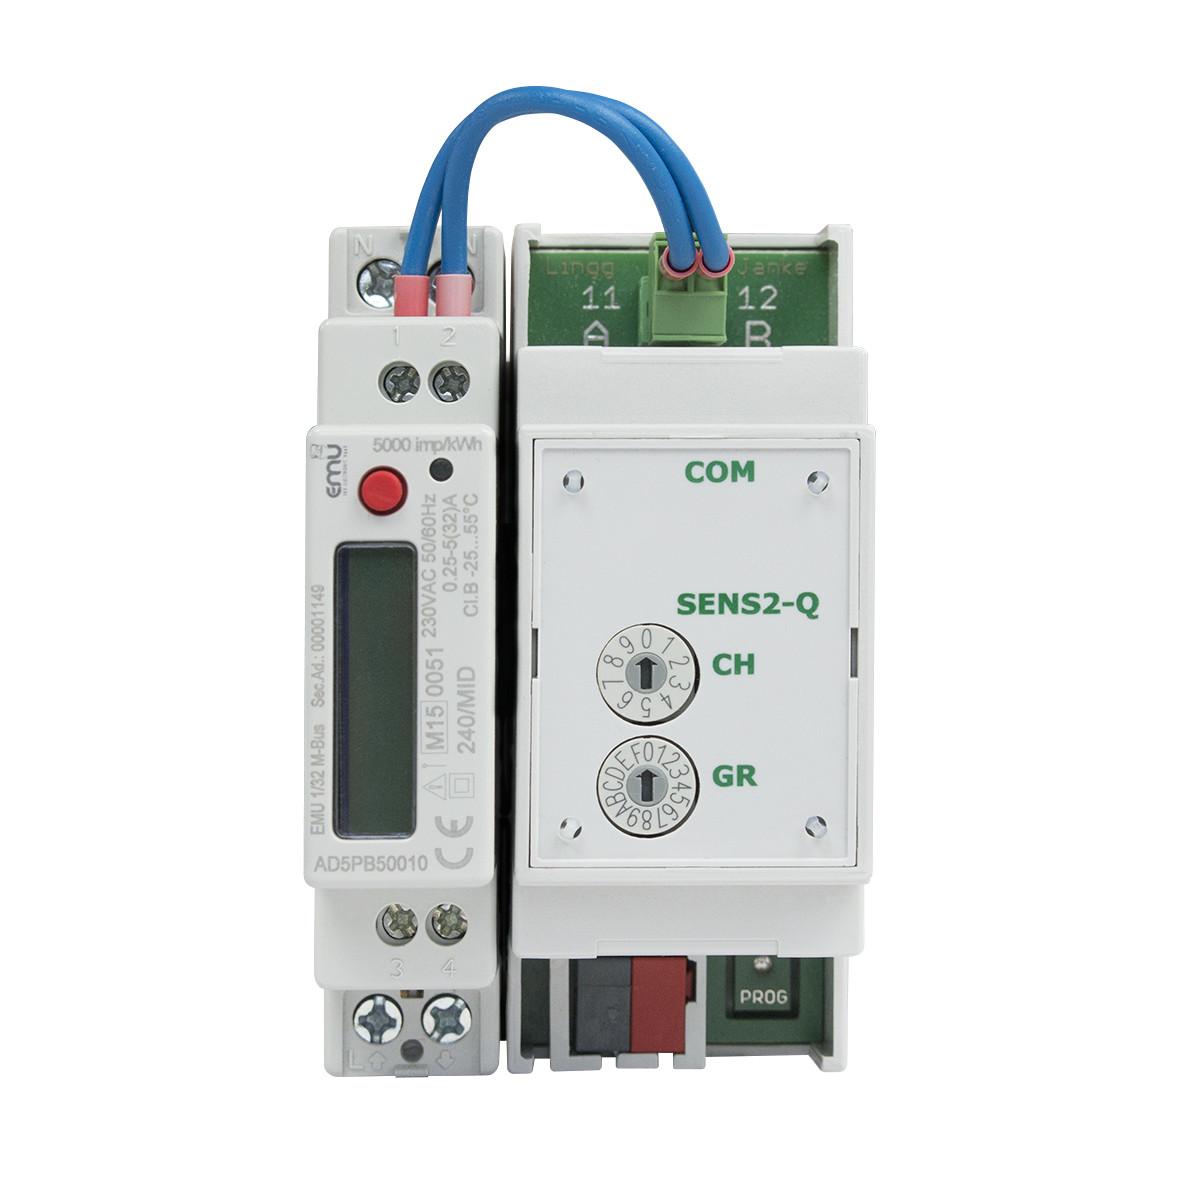 87763_EZ EMU 1PH__92471.1550166408.1280.1280?c=2 knx electricity meter emu, 1 phase, direct measurement knx shop online